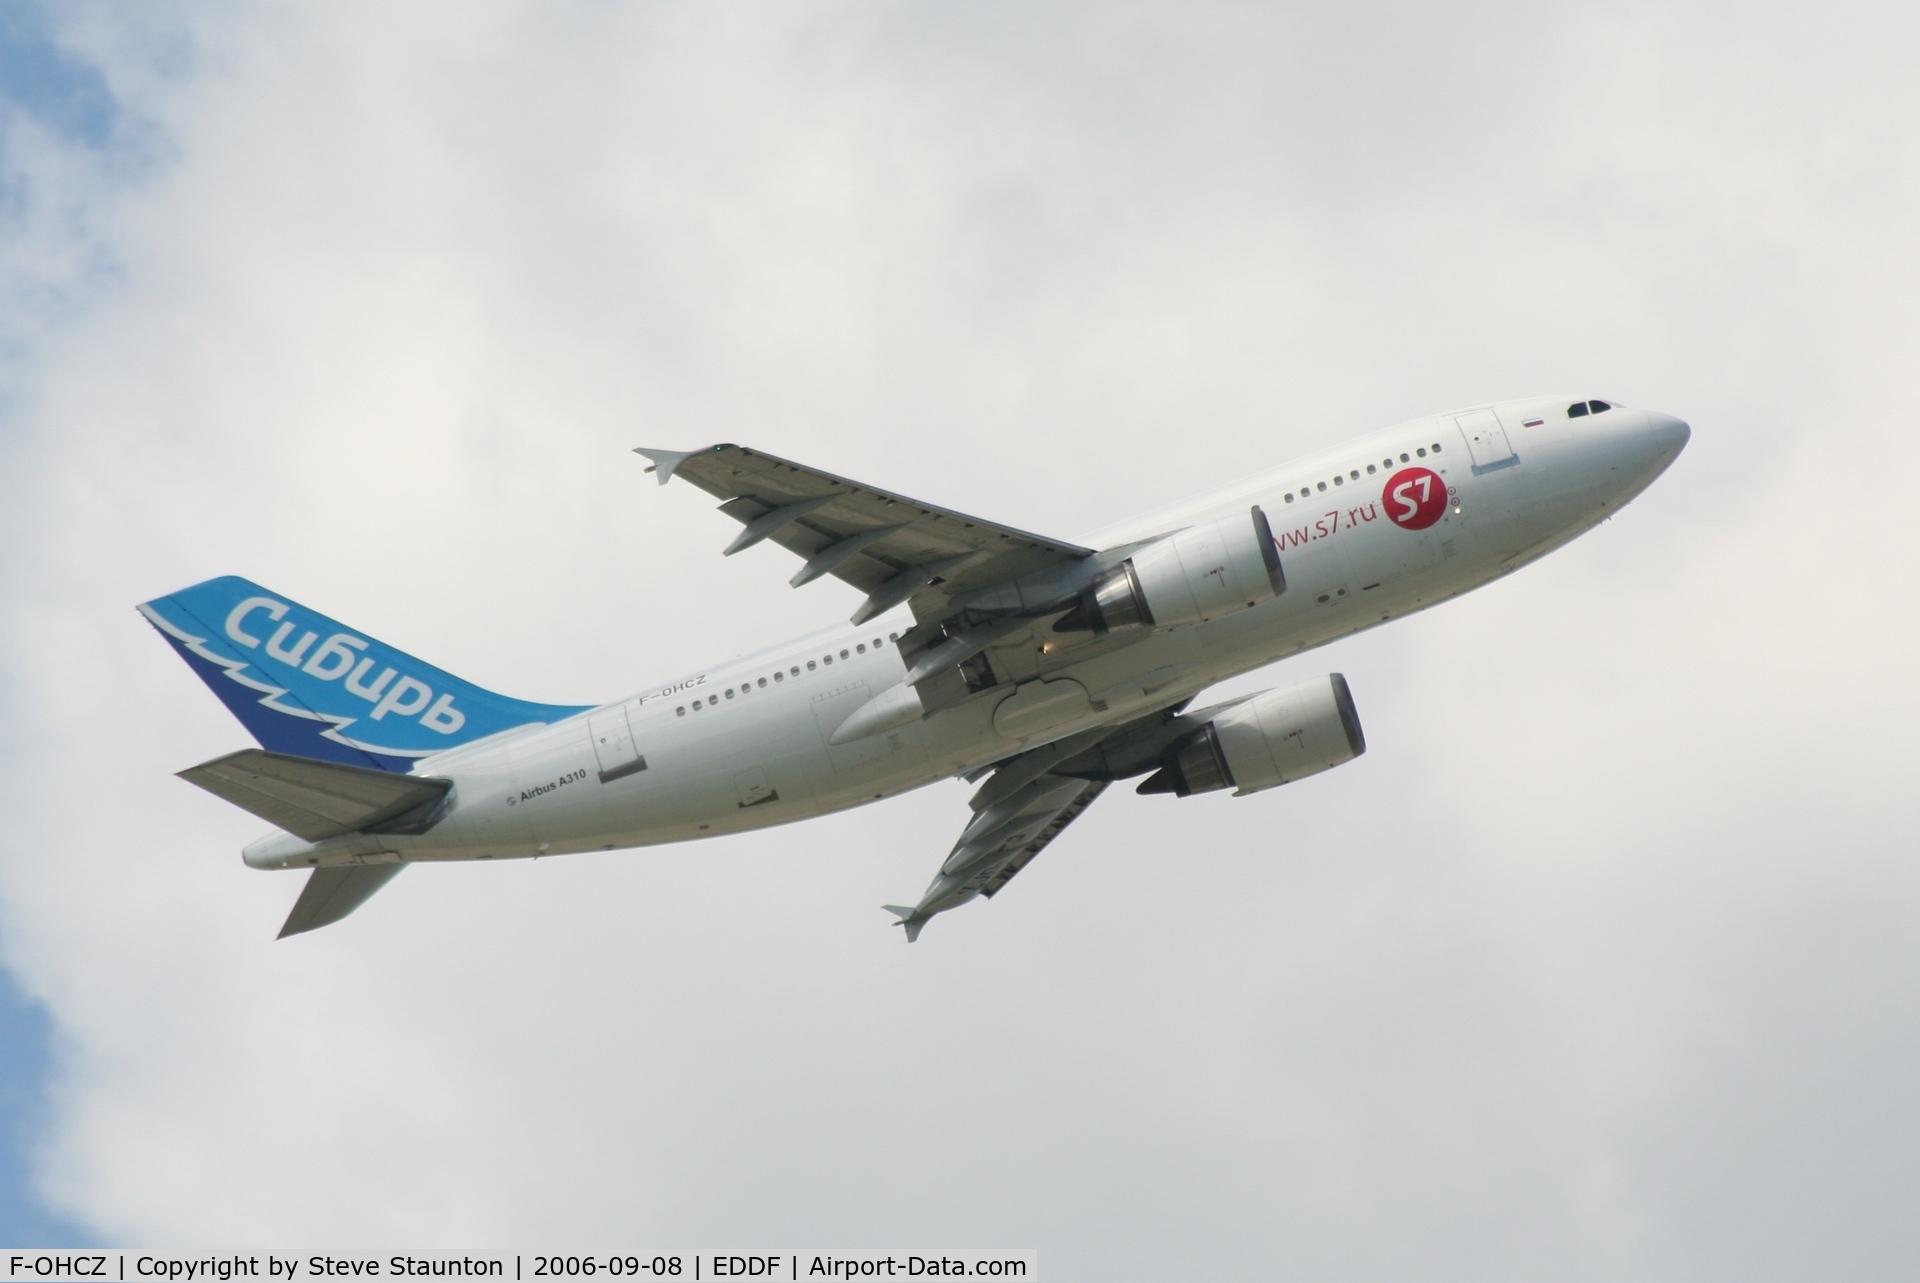 F-OHCZ, 1988 Airbus A310-304/ET C/N 475, Taken at Frankfurt September 2006